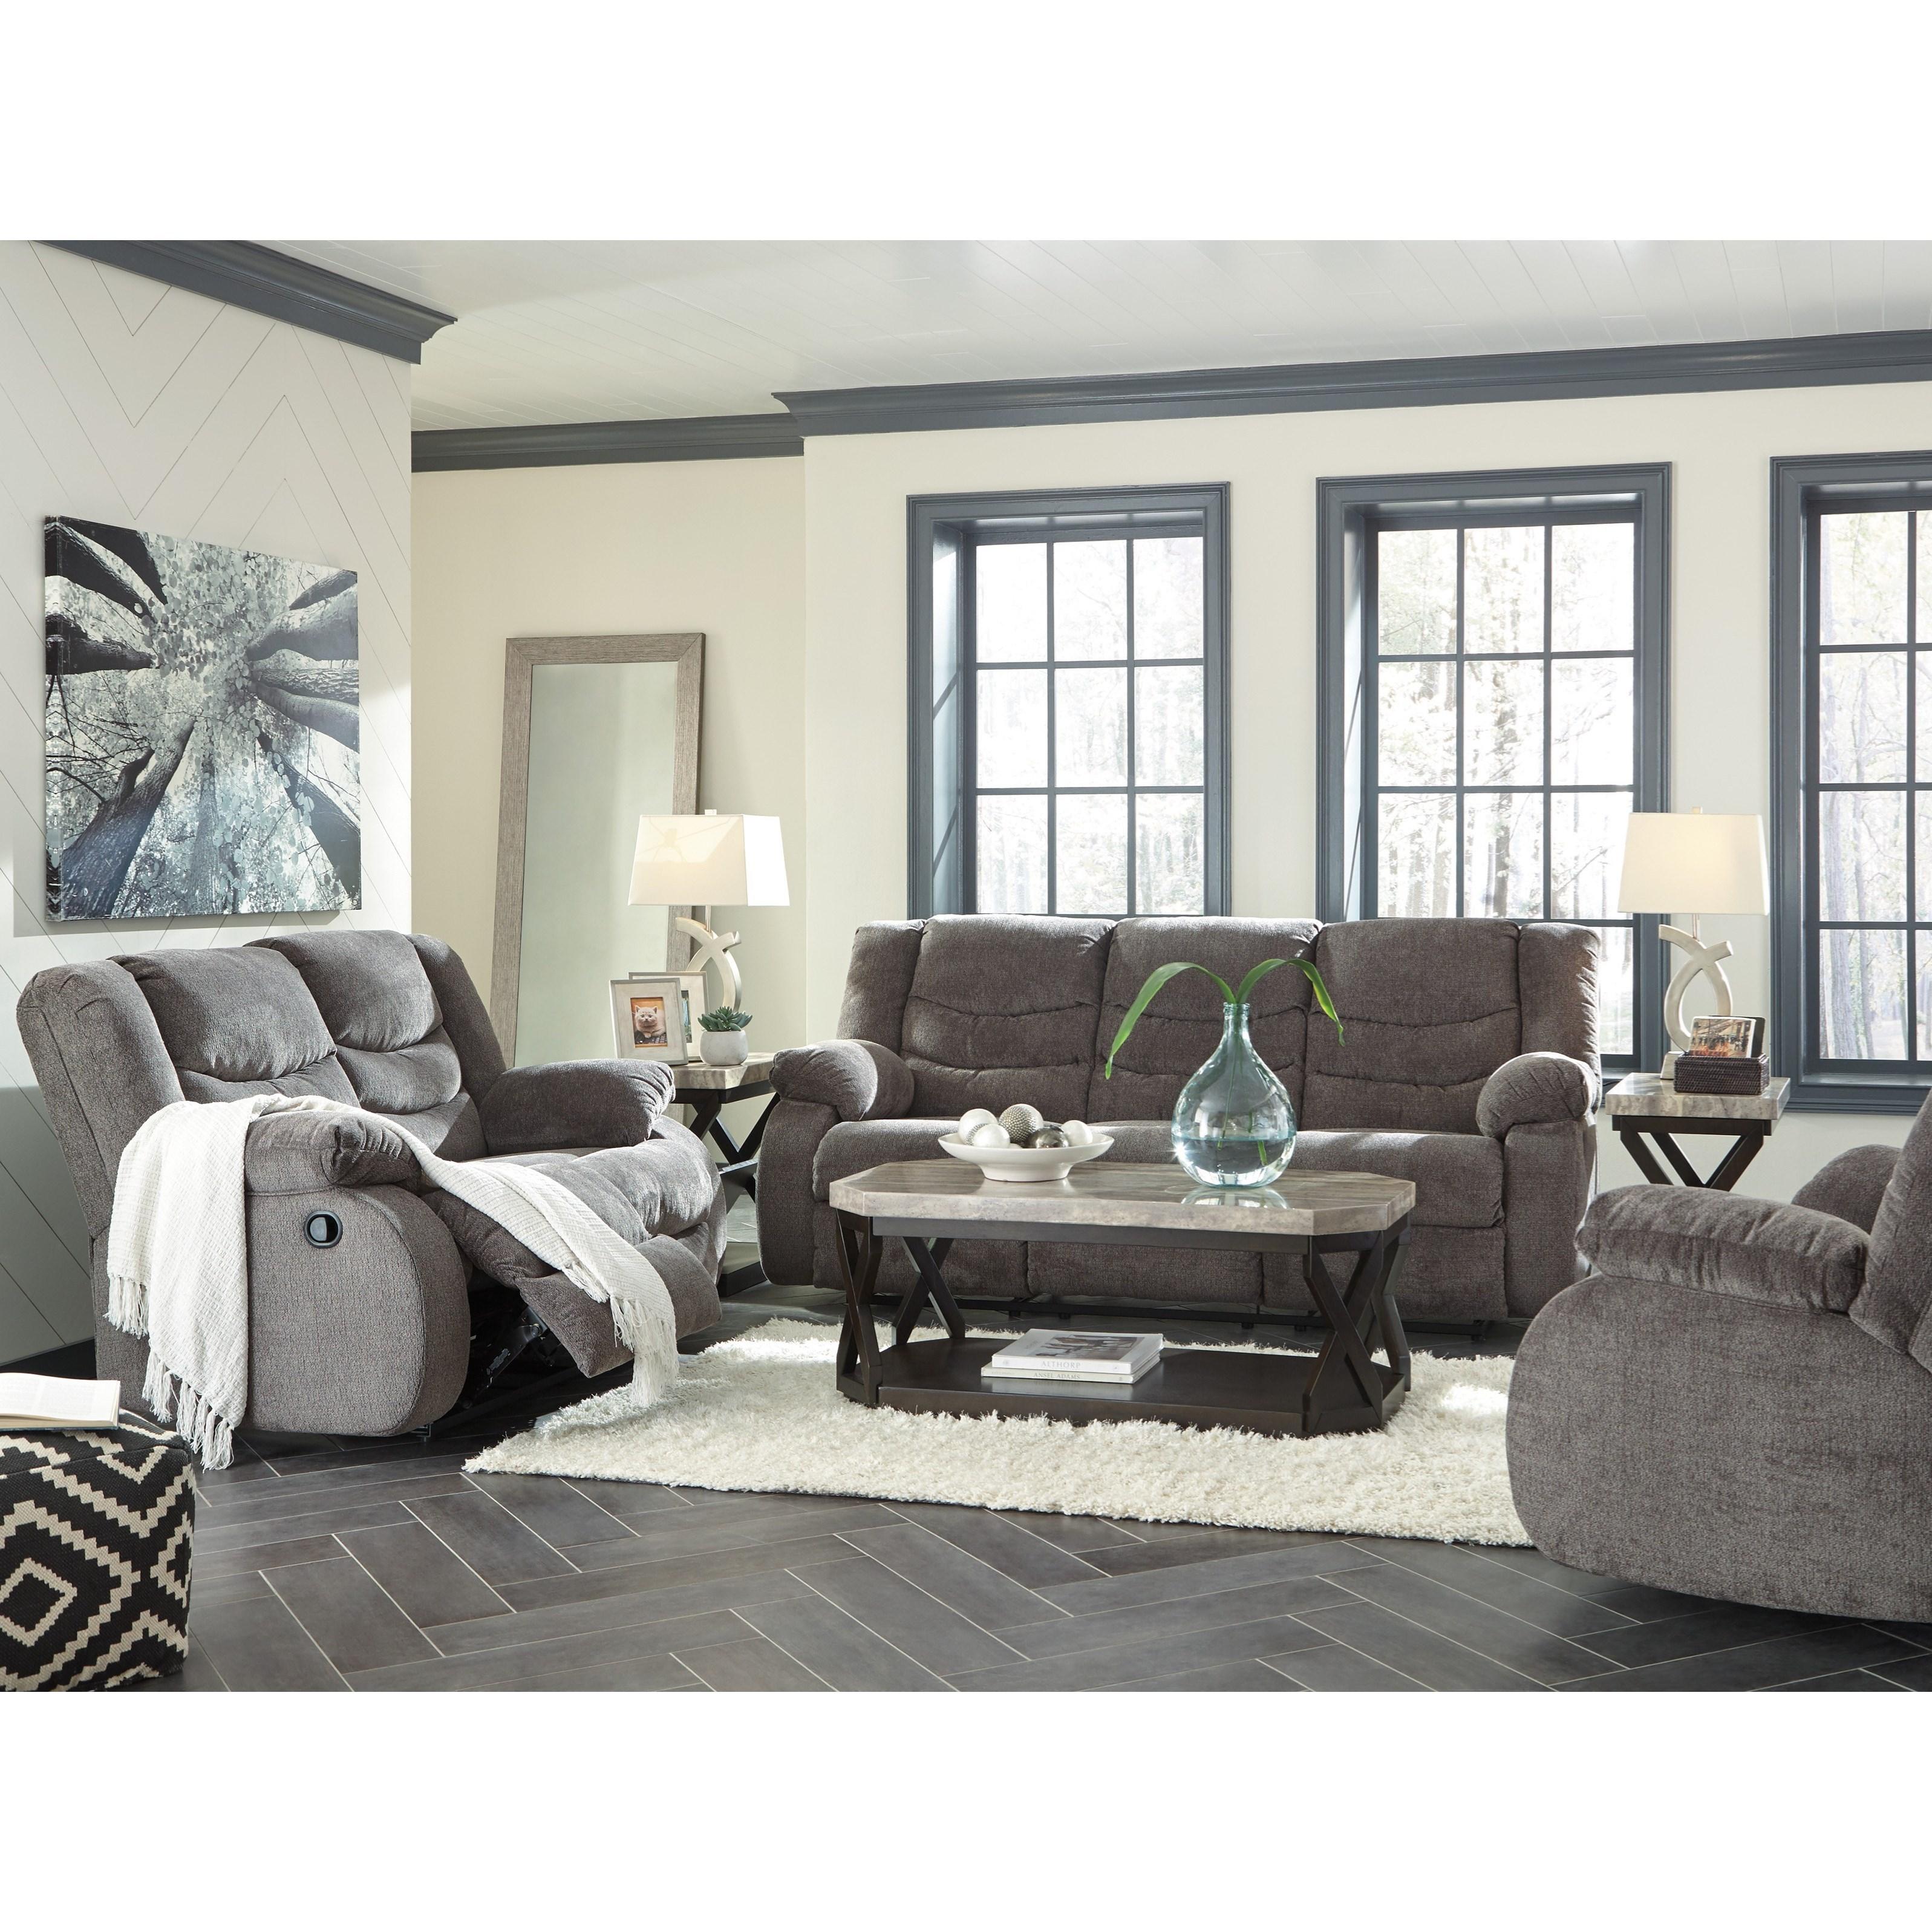 Ashley Signature Design Tulen Reclining Living Room Group Dunk Bright